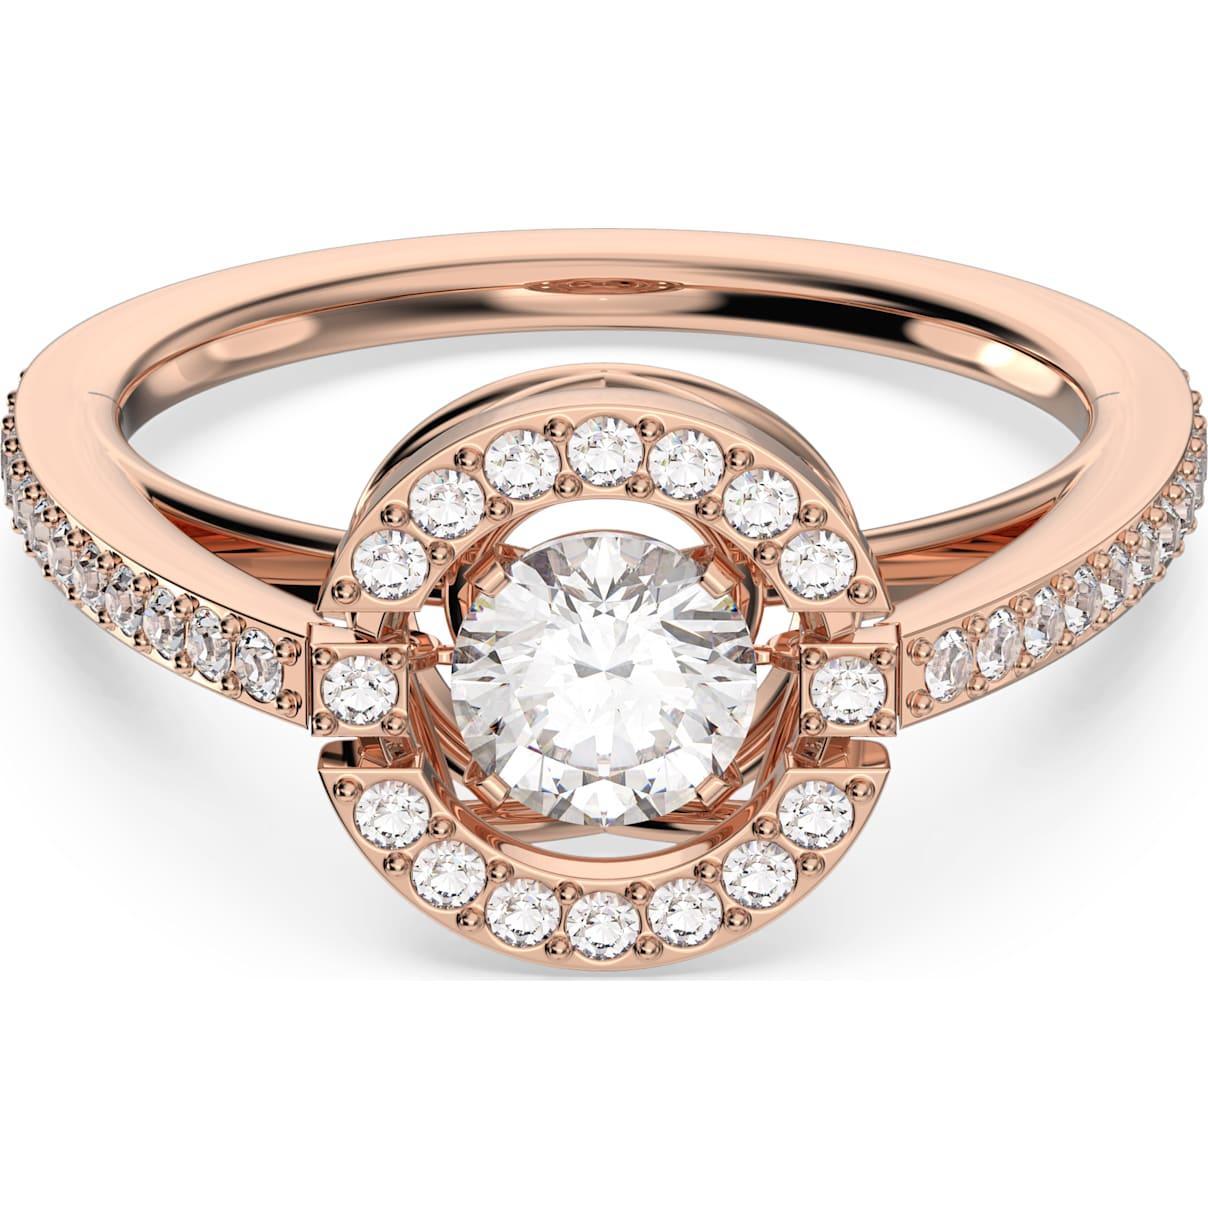 Swarovski Swarovski Sparkling Dance Round Ring, White, Rose-gold tone plated